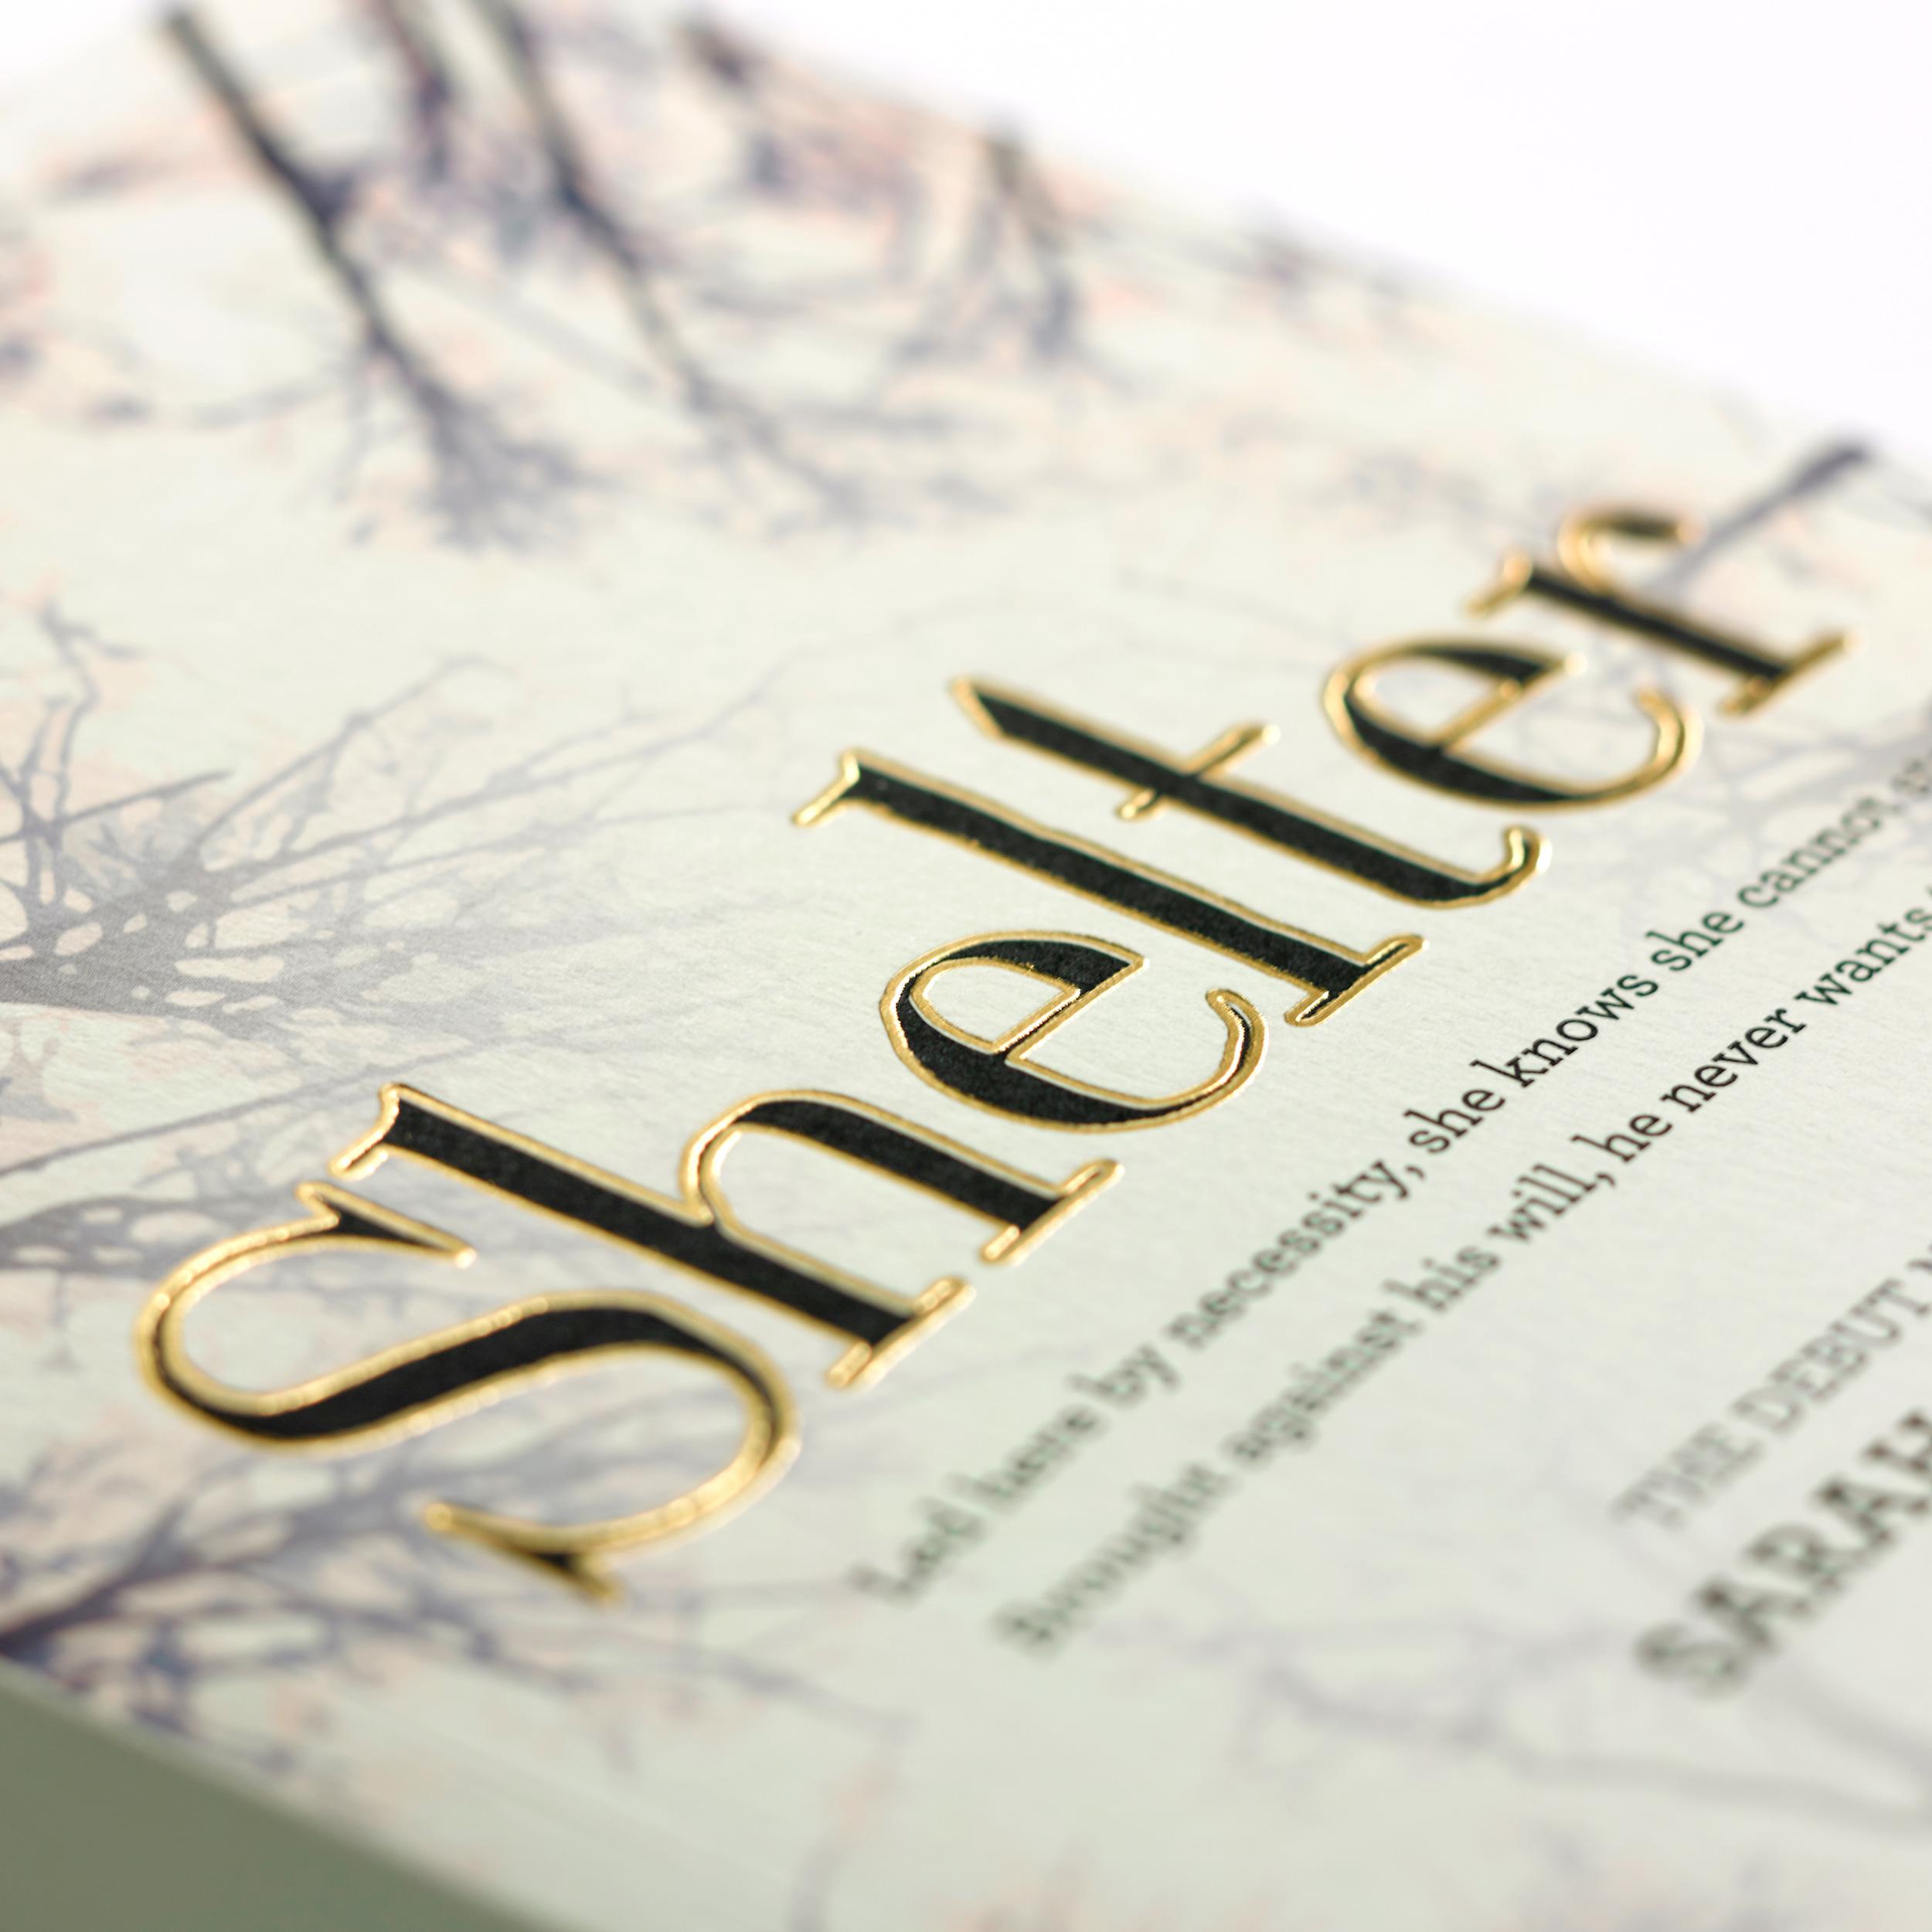 Shelter Book Cover Design